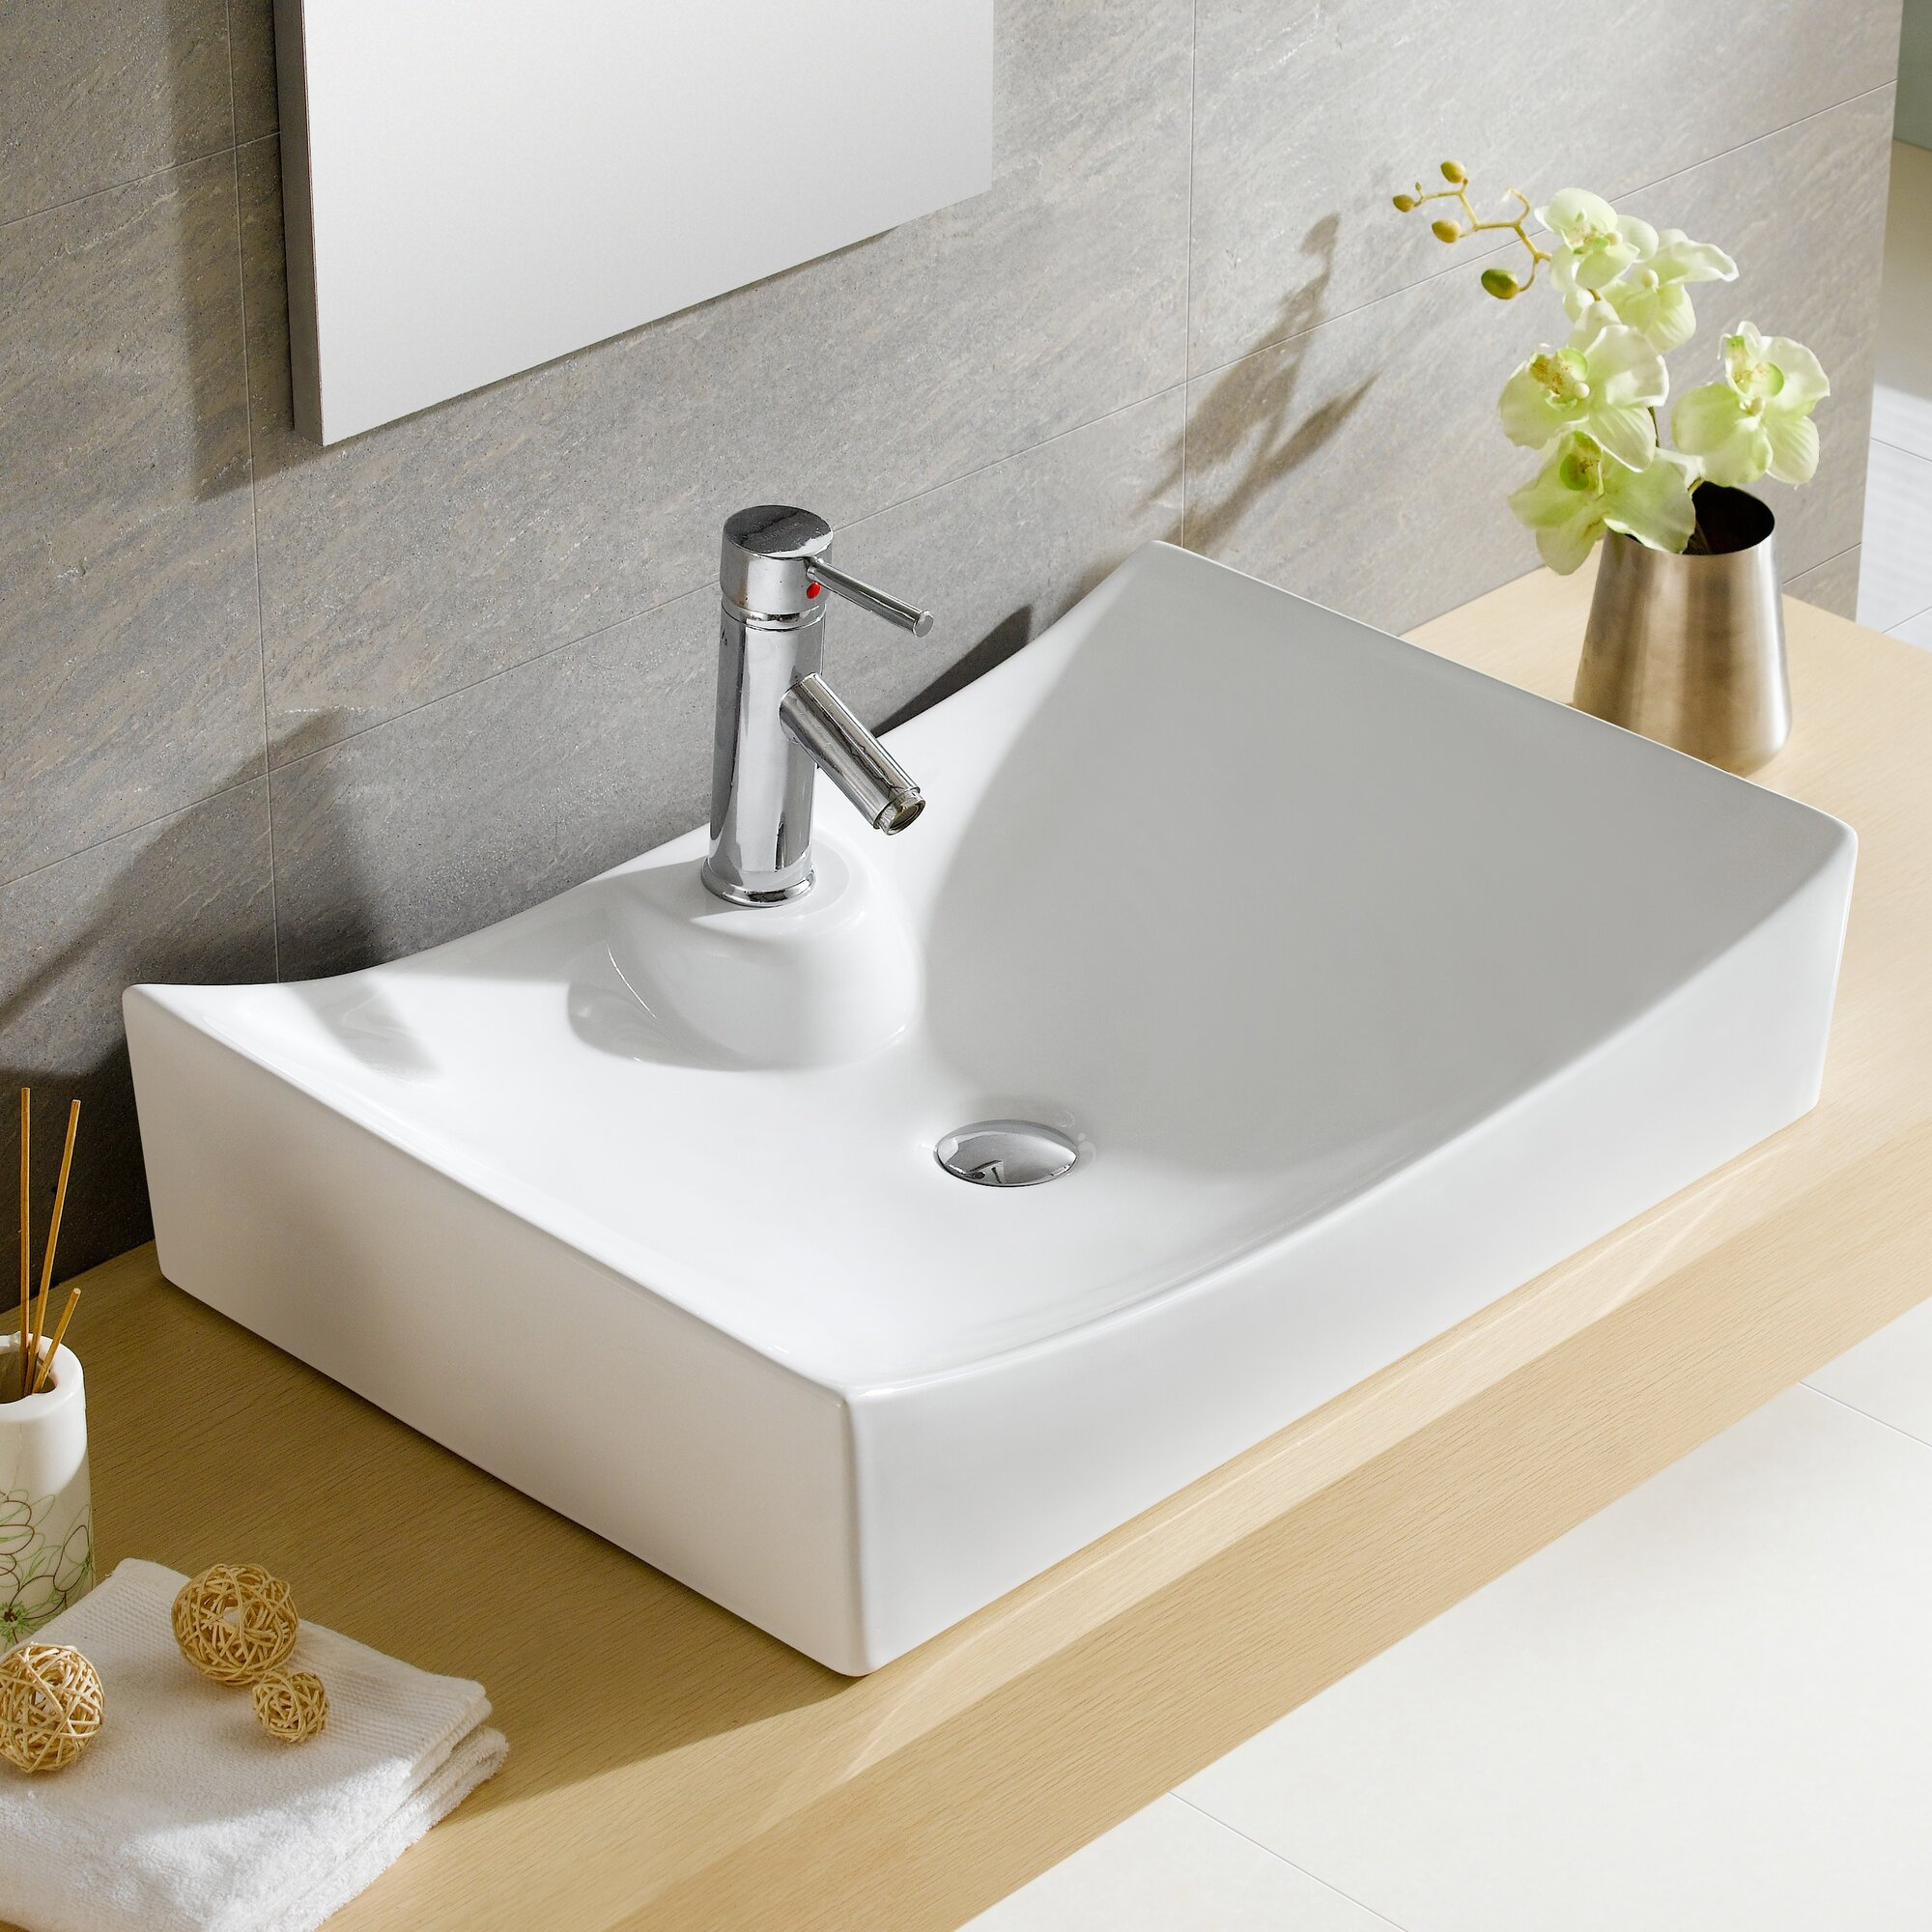 Bathroom Sink: Fine Fixtures Modern Vitreous Bulging Square Vessel